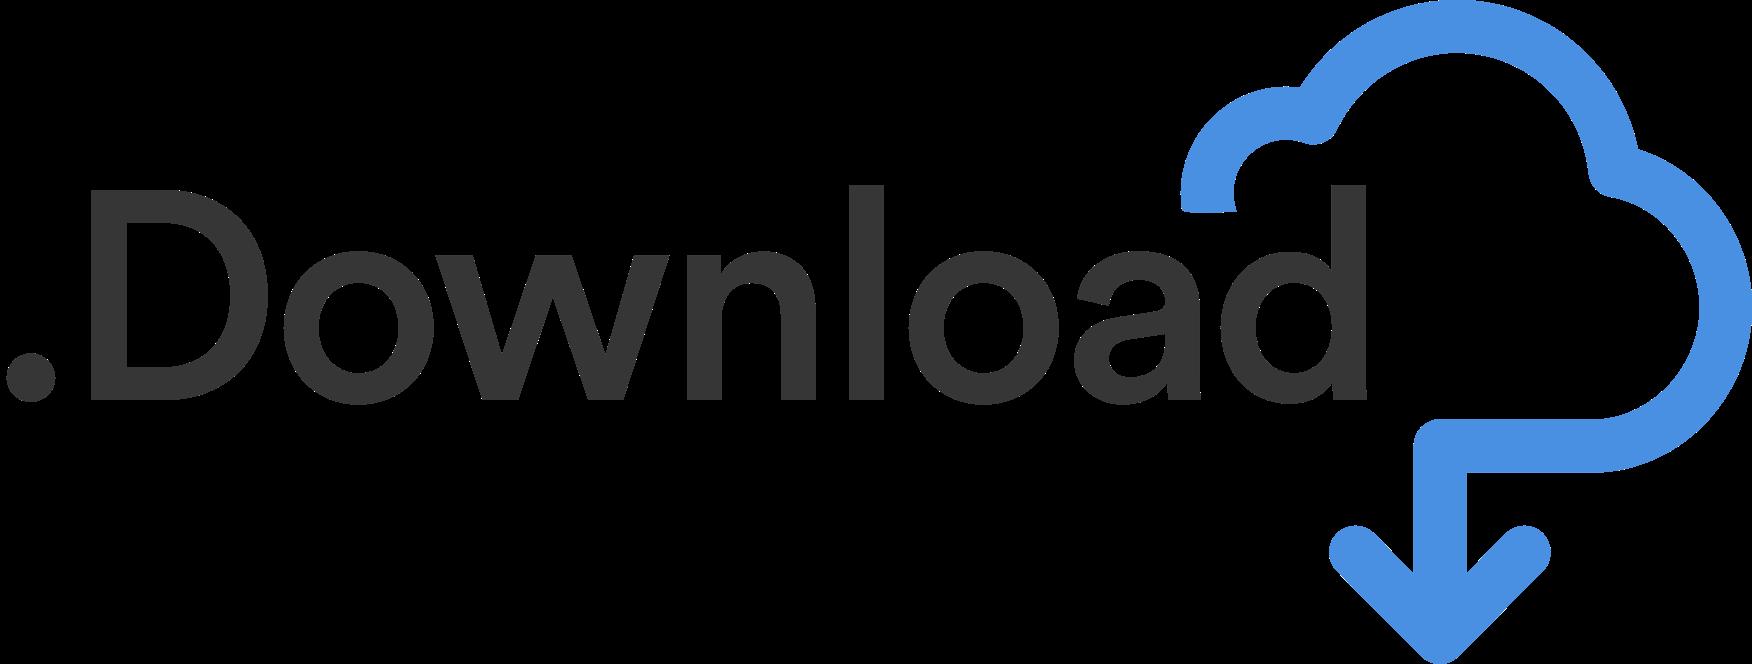 .download domain name registration